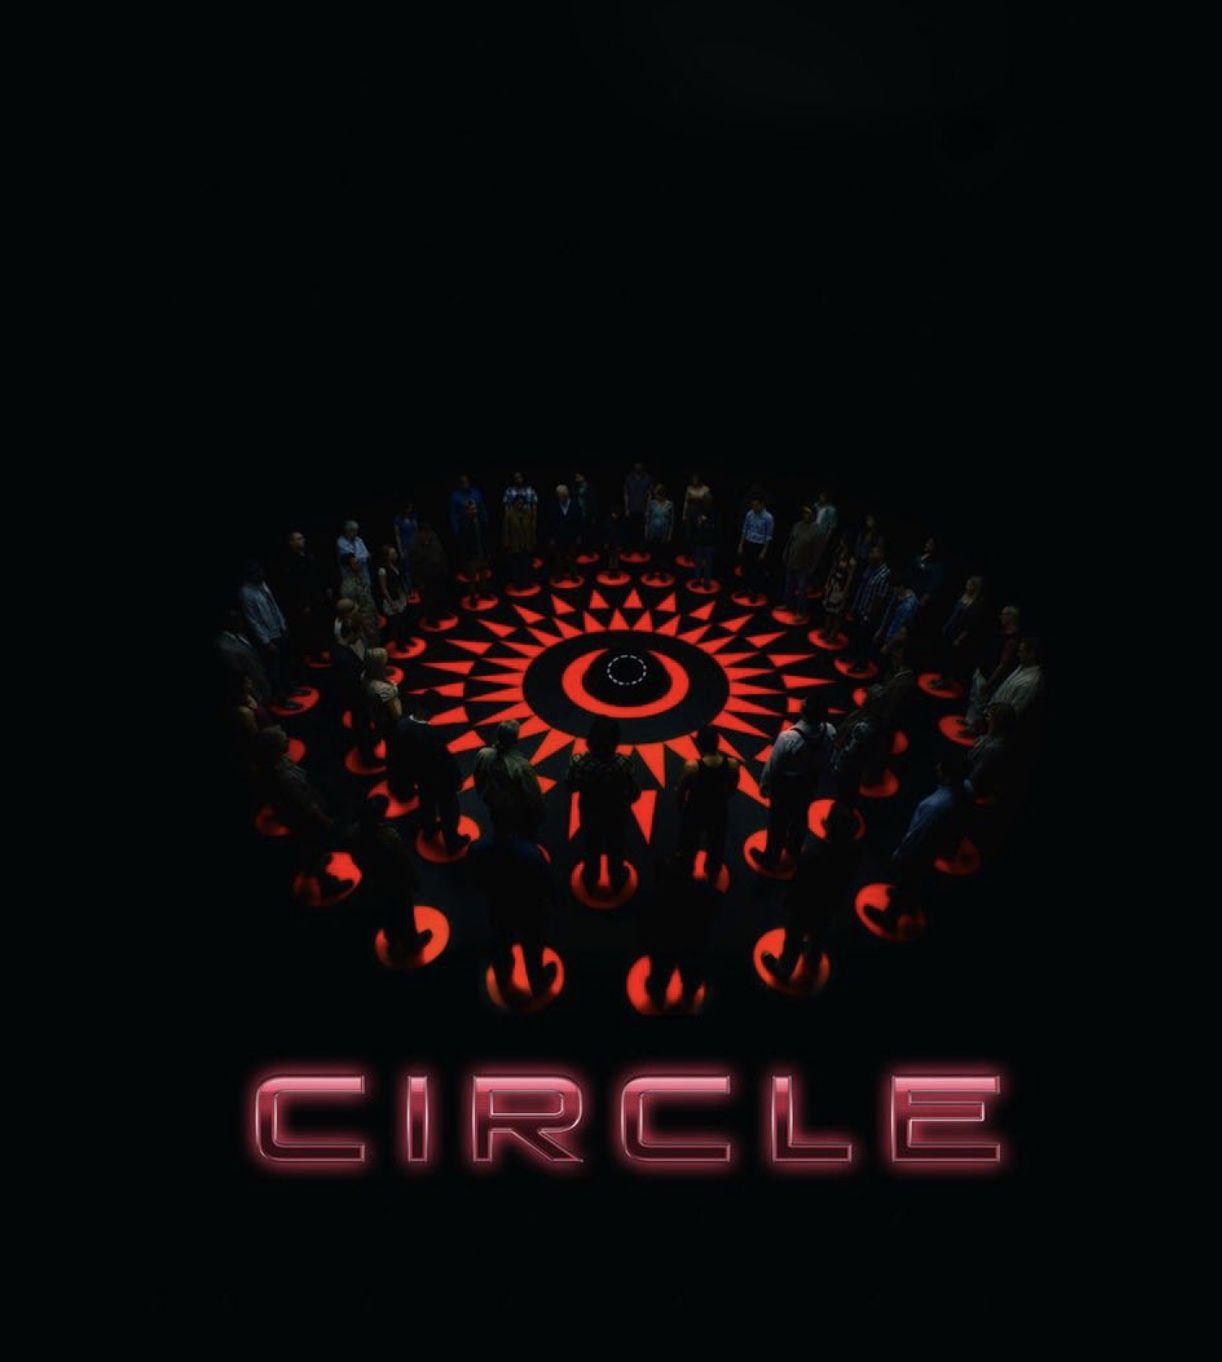 Circle horror movies movie posters movies